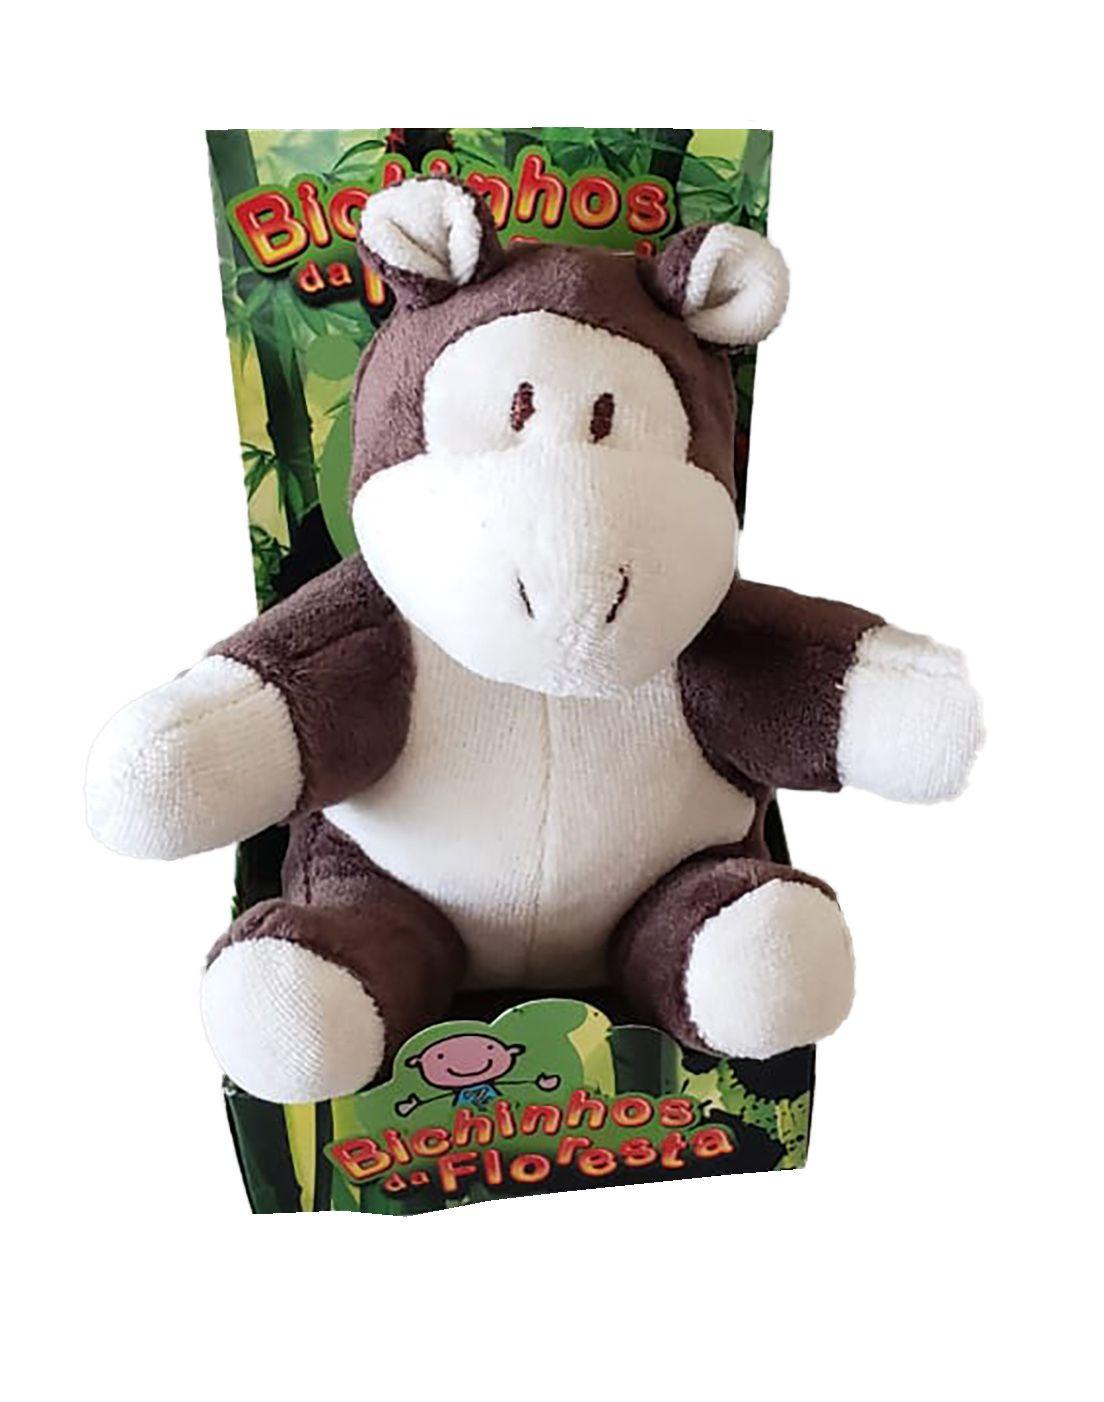 Chocalho Sensorial Mini Macaco Zip Toys  Bichos da Floresta